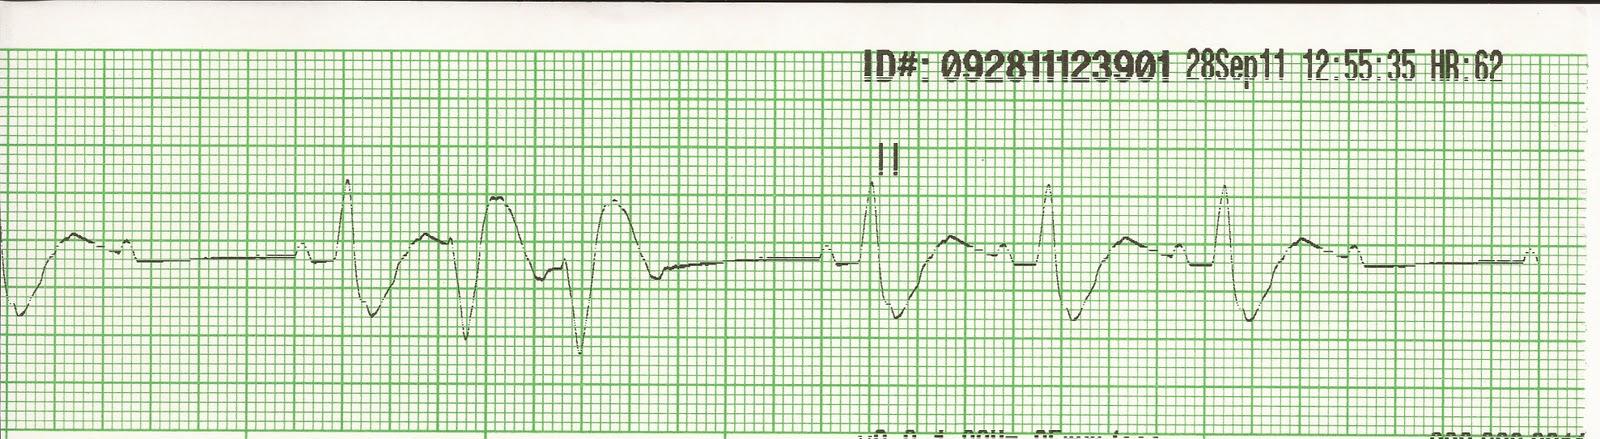 Float Nurse: EKG Rhythm Strips 20: Ventricular Ectopy 3